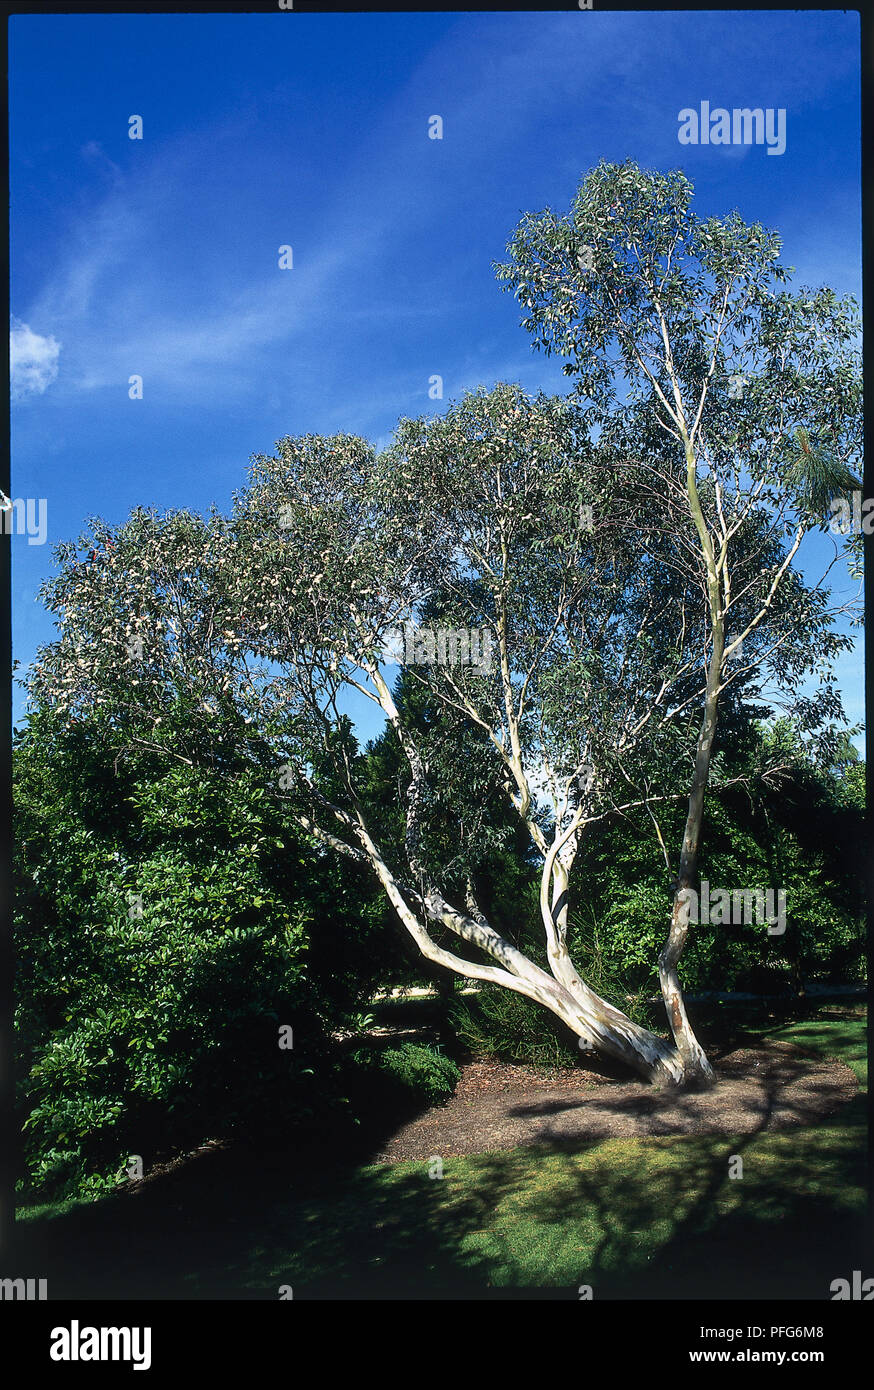 Eucalyptus pauciflora ssp niphophila (Alpine snow gum), tree in park - Stock Image